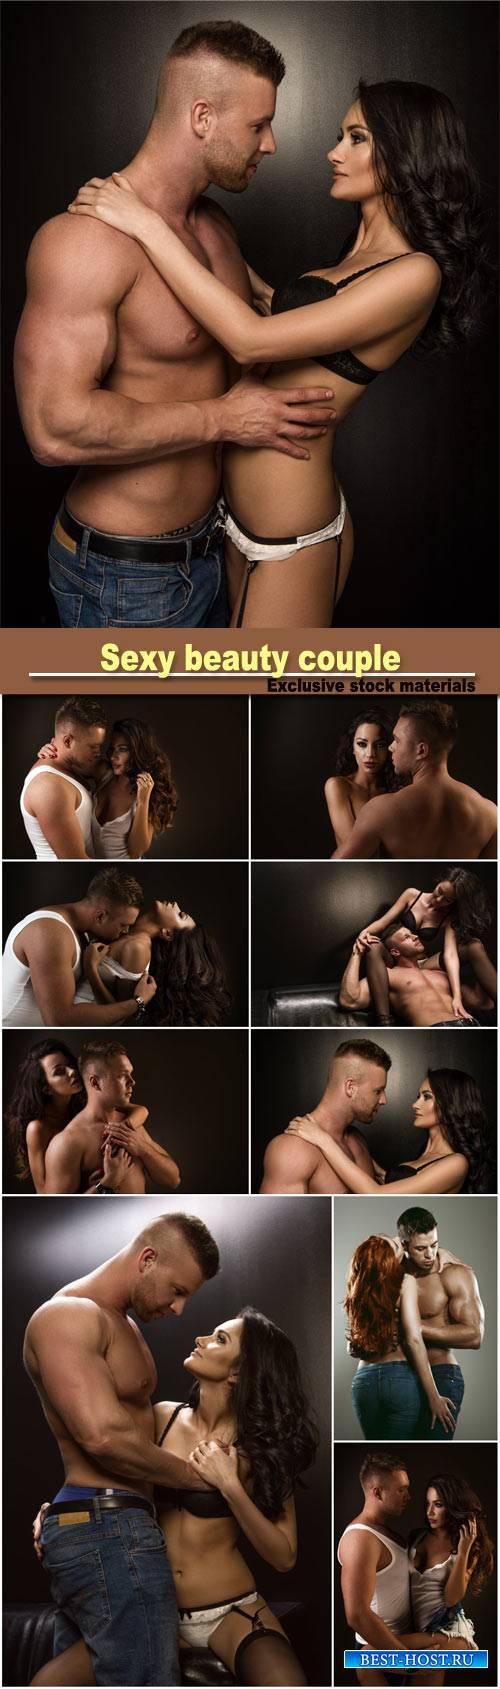 Sexy beauty couple, passionate couple in studio